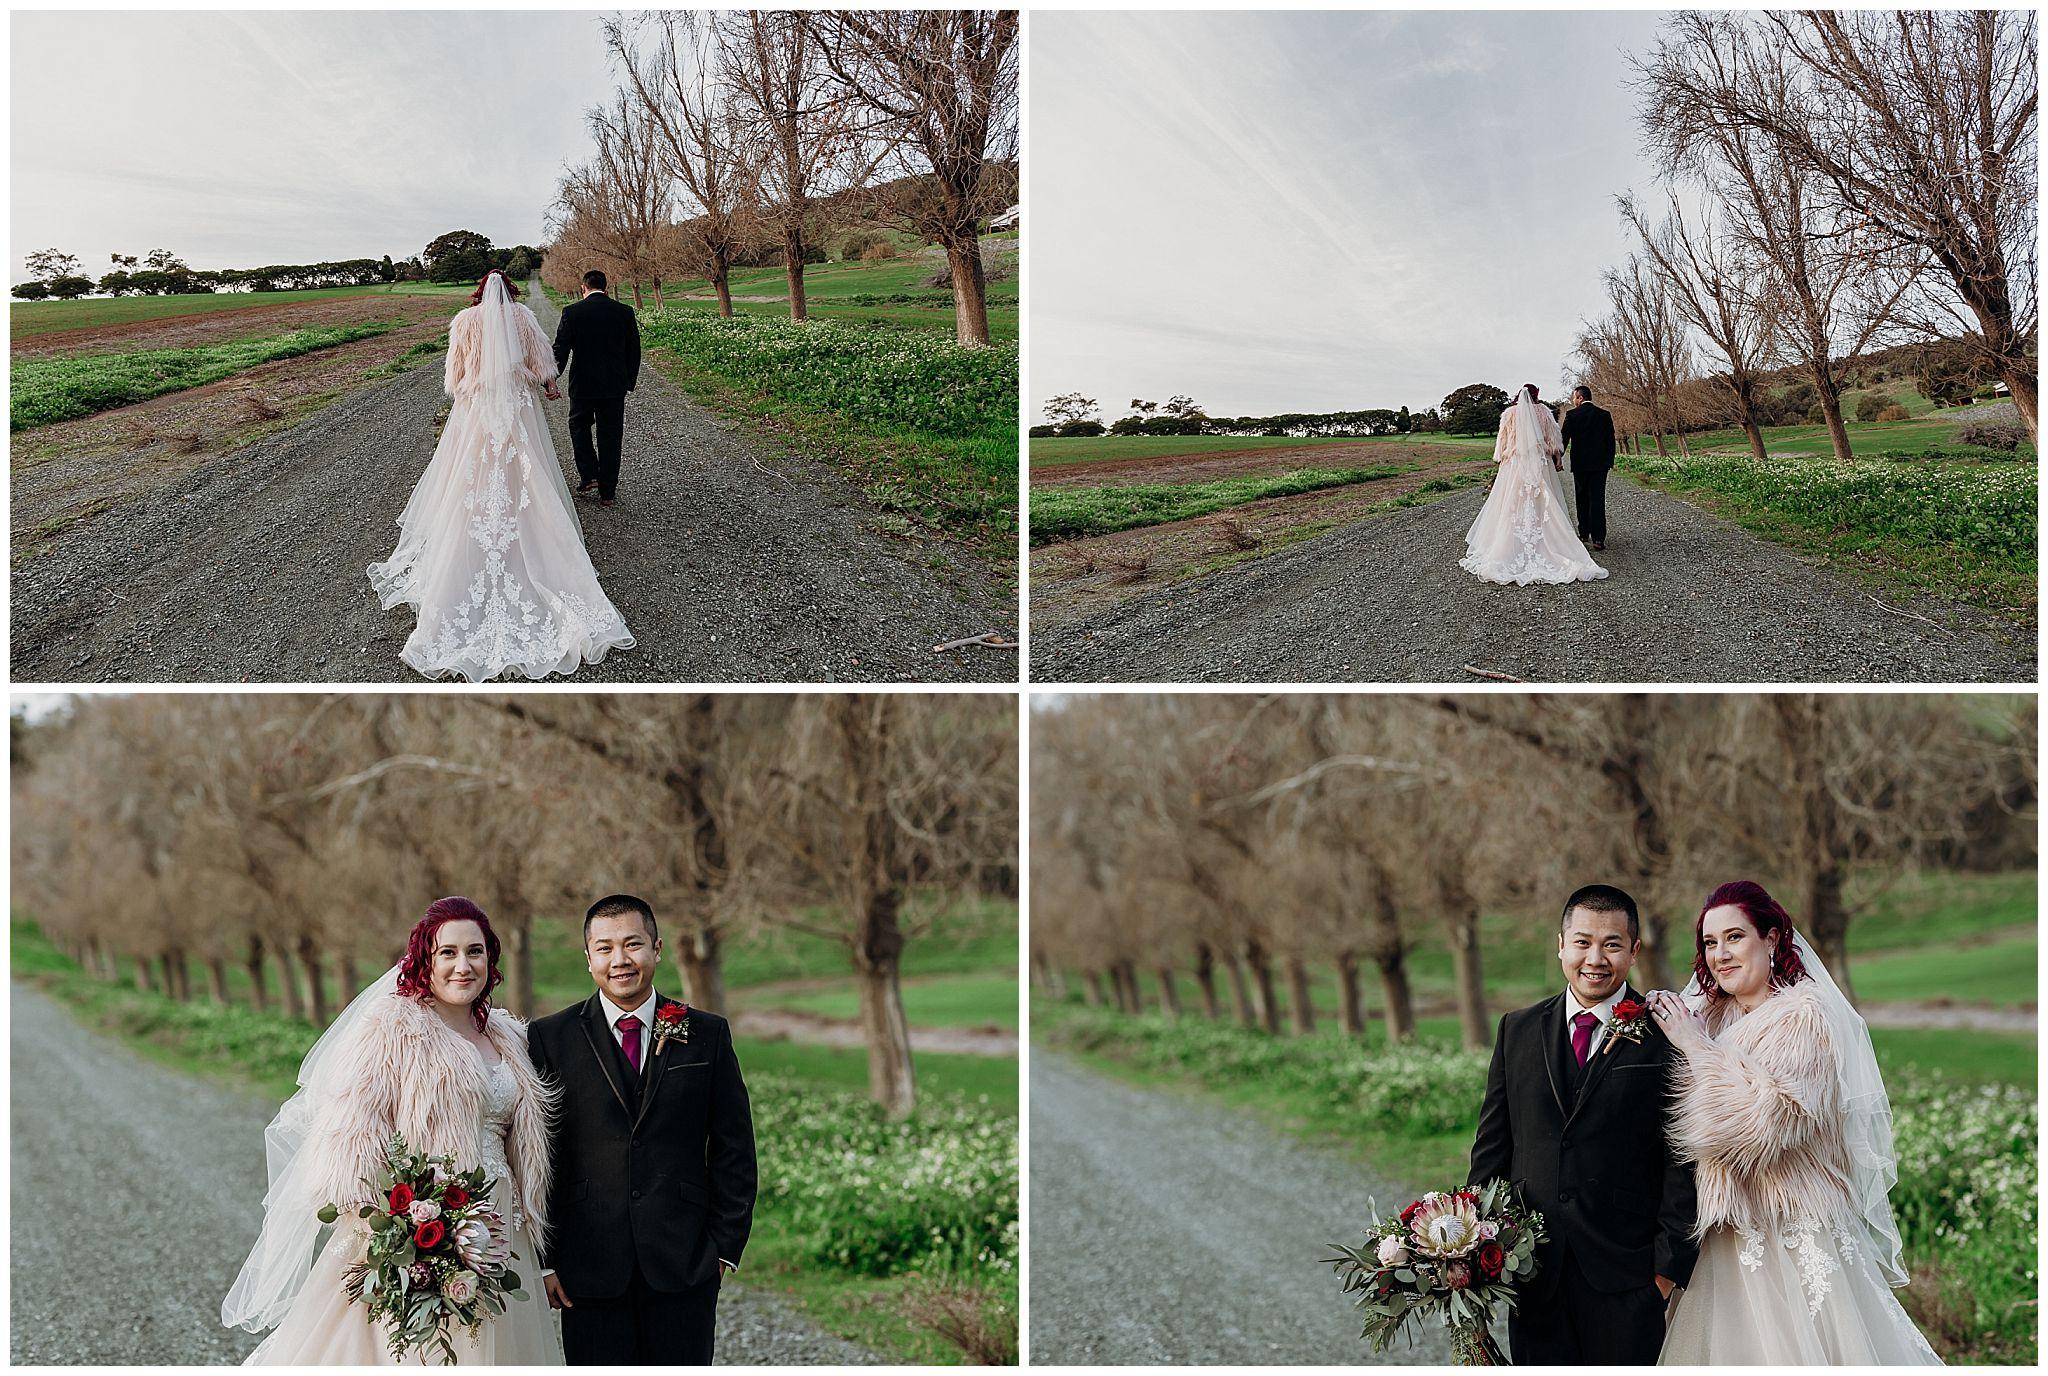 quarry-farm-wa-bridal-party-wedding-photographs